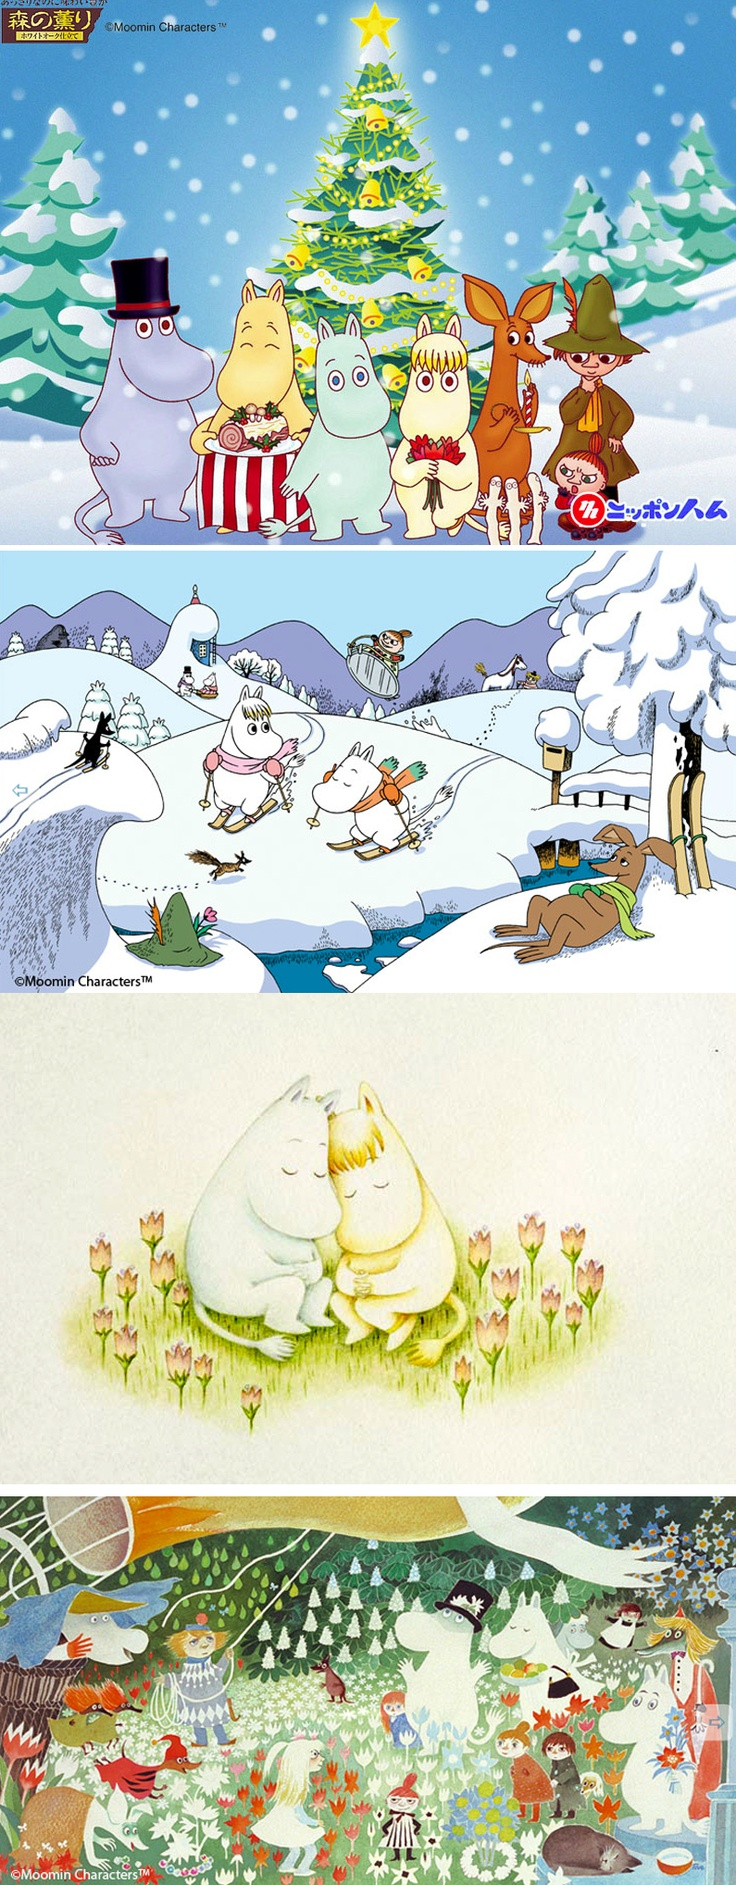 嚕嚕米 Moomin